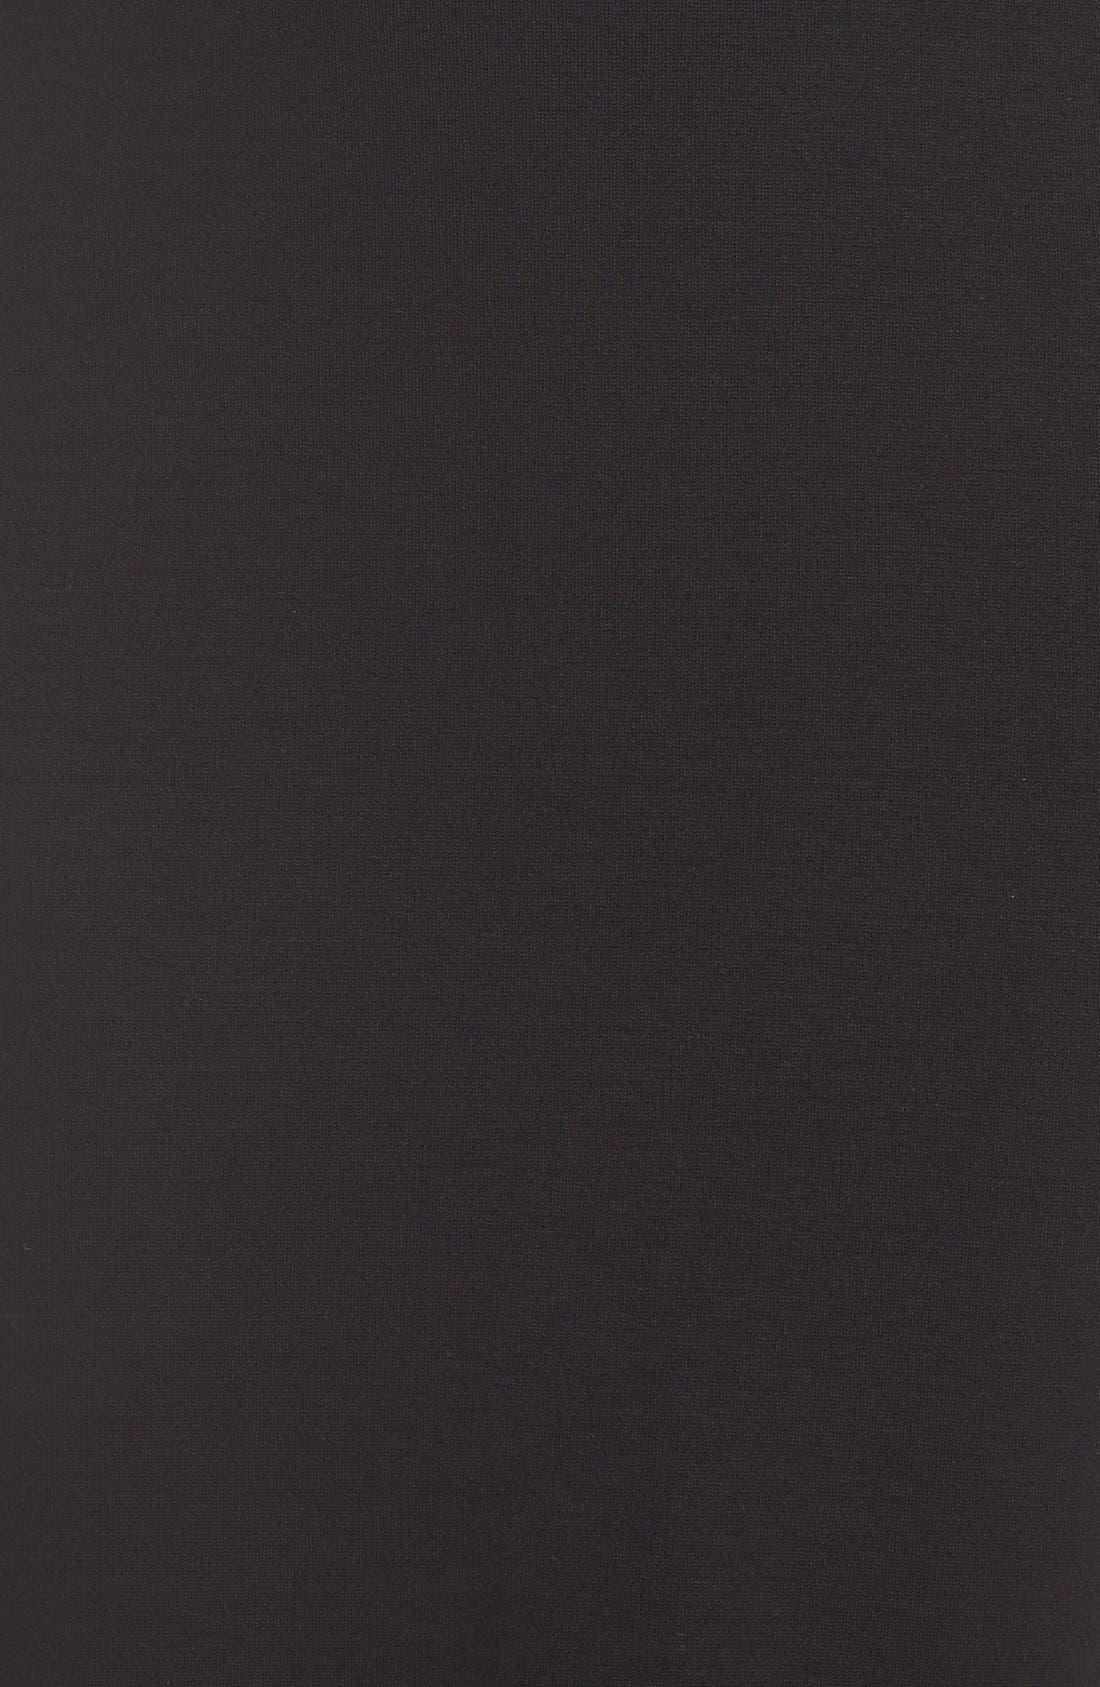 'Viven' Lace & Jersey Sheath Dress,                             Alternate thumbnail 2, color,                             001